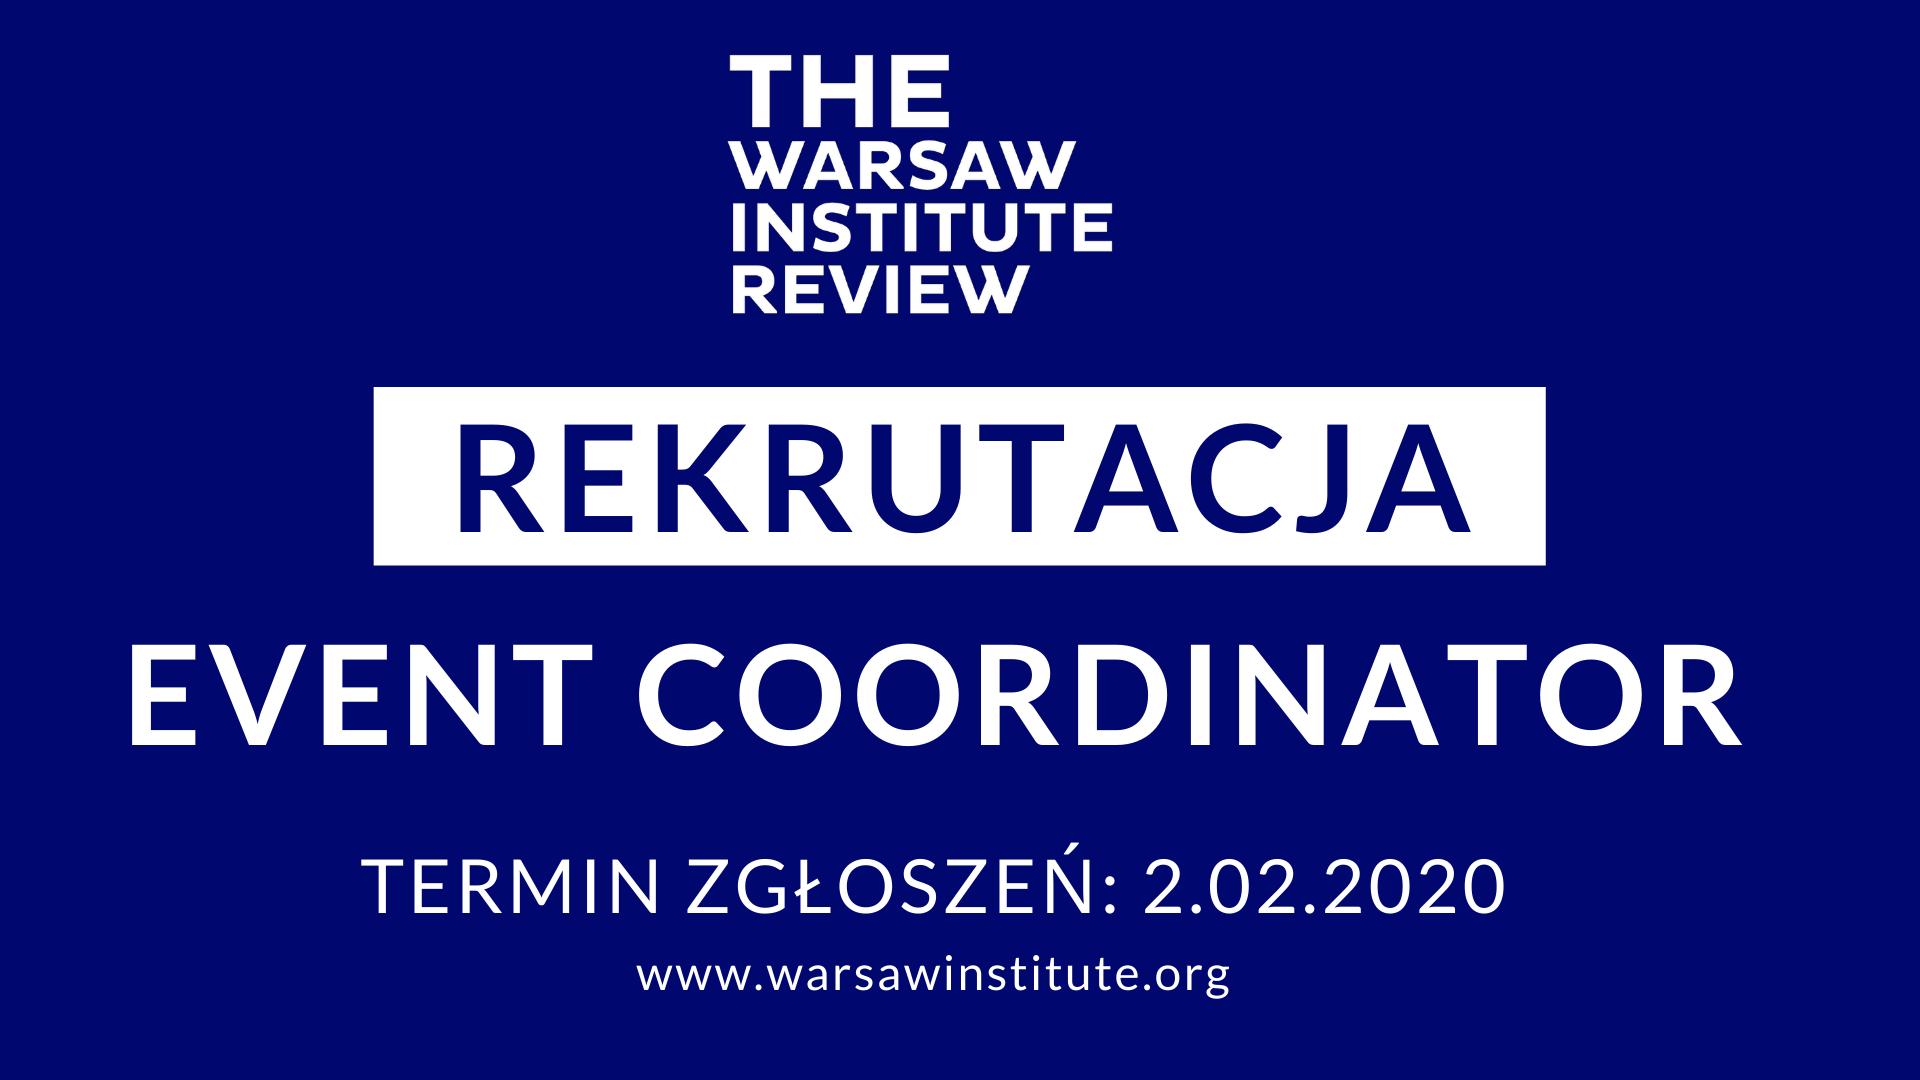 Rekrutacja na stanowisko Event Coordinator